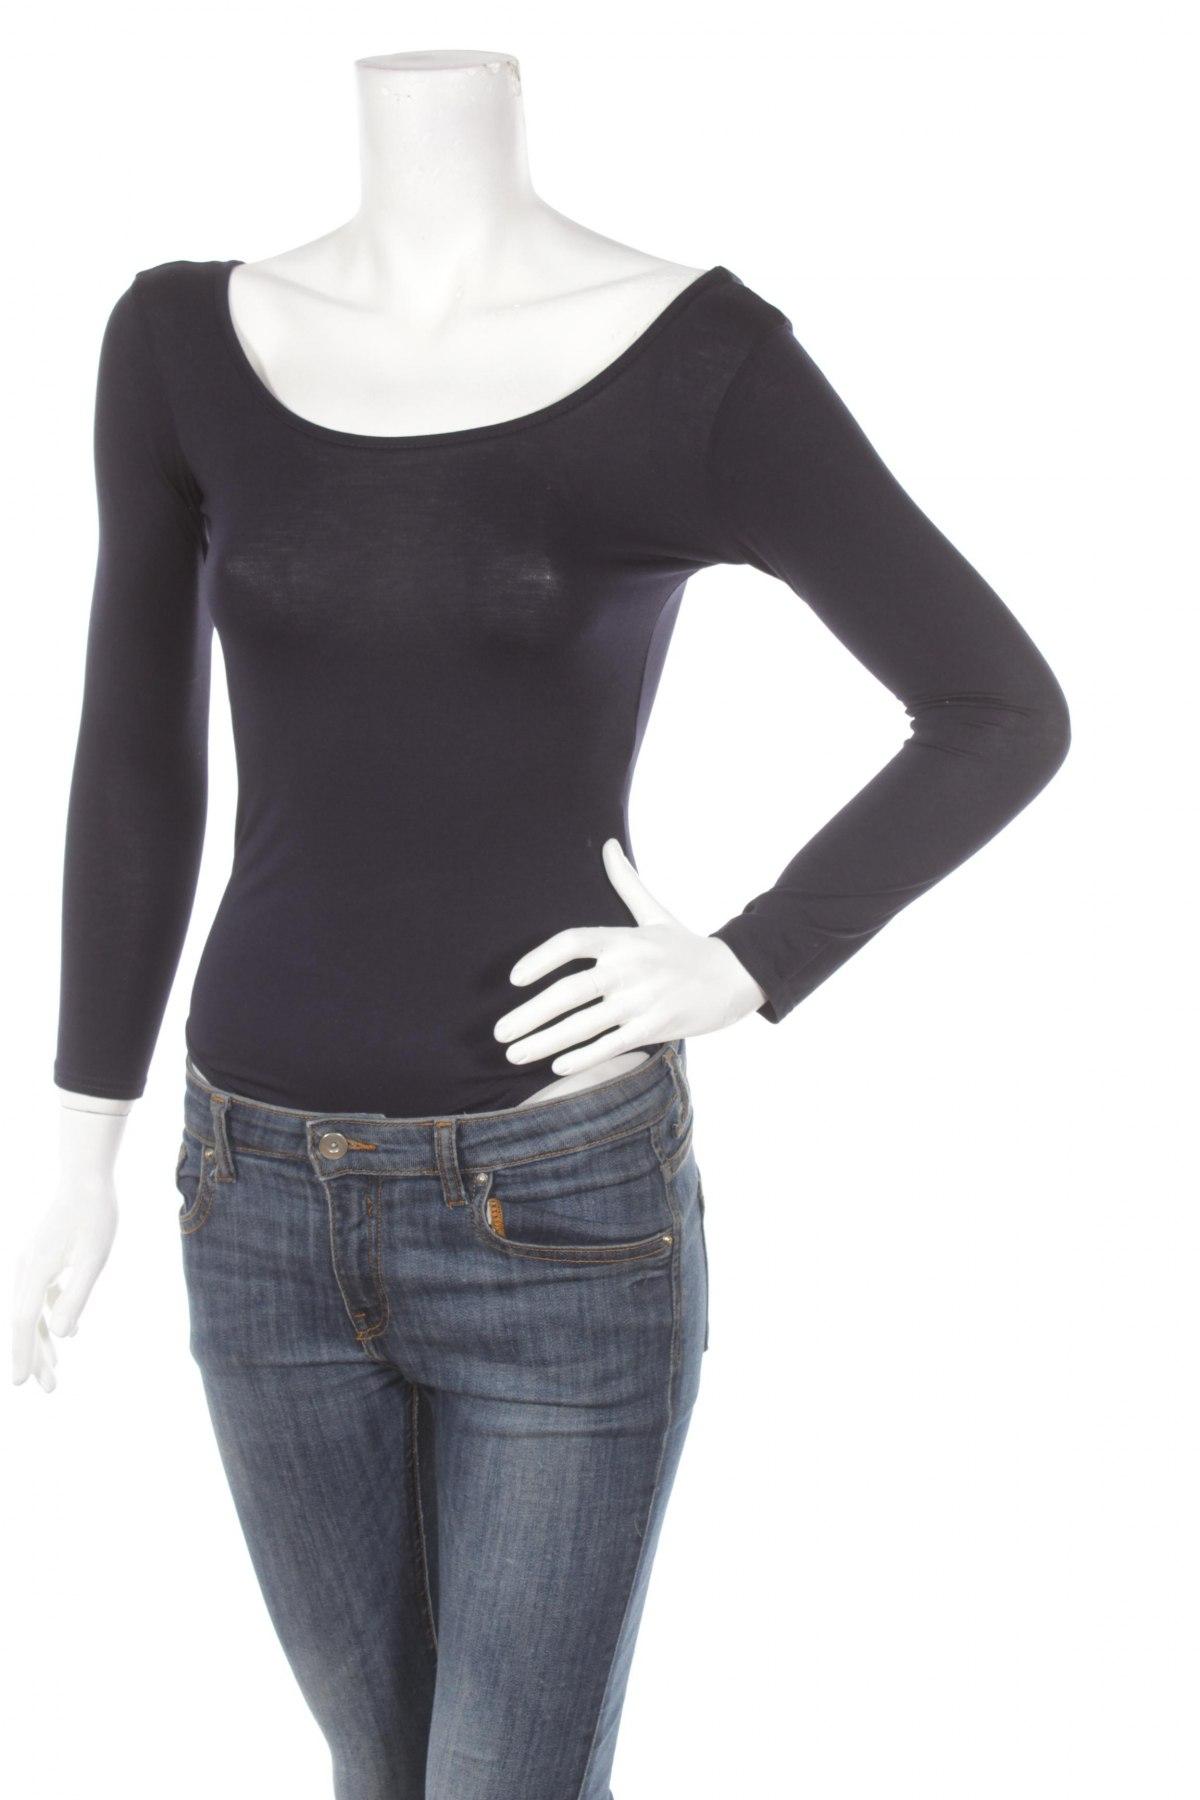 cb49db06a6c6 Γυναικεία μπλούζα-κορμάκι Signature - σε συμφέρουσα τιμή στο Remix ...